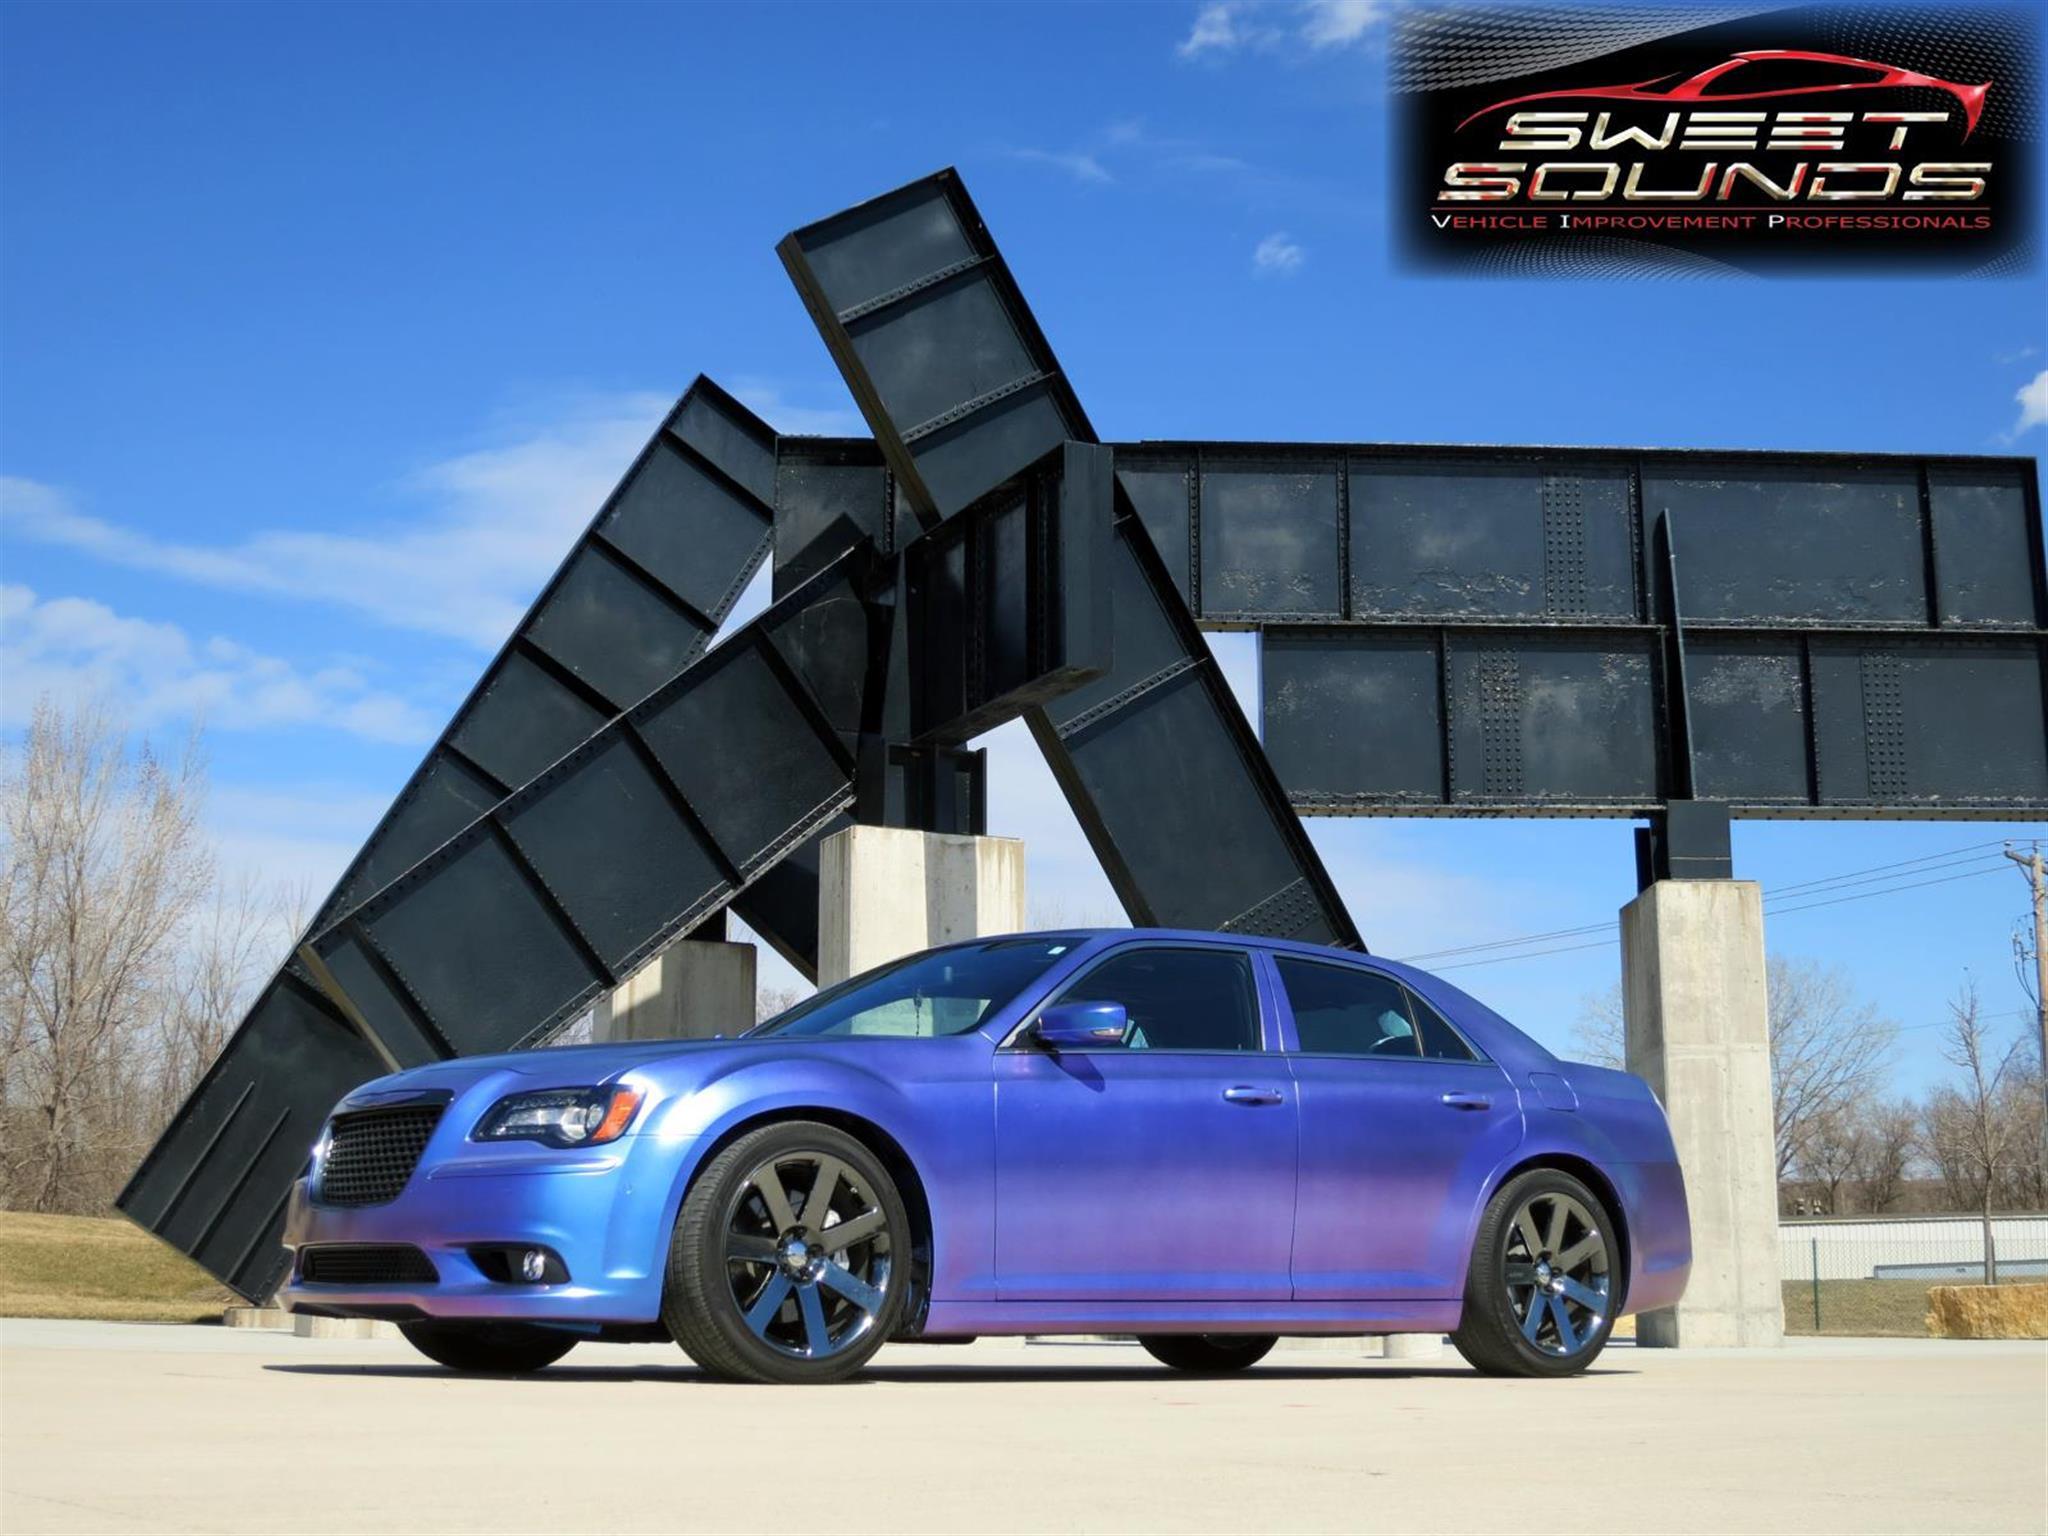 Chrysler - 300 - 2012 - Paint -  Wraps & Body